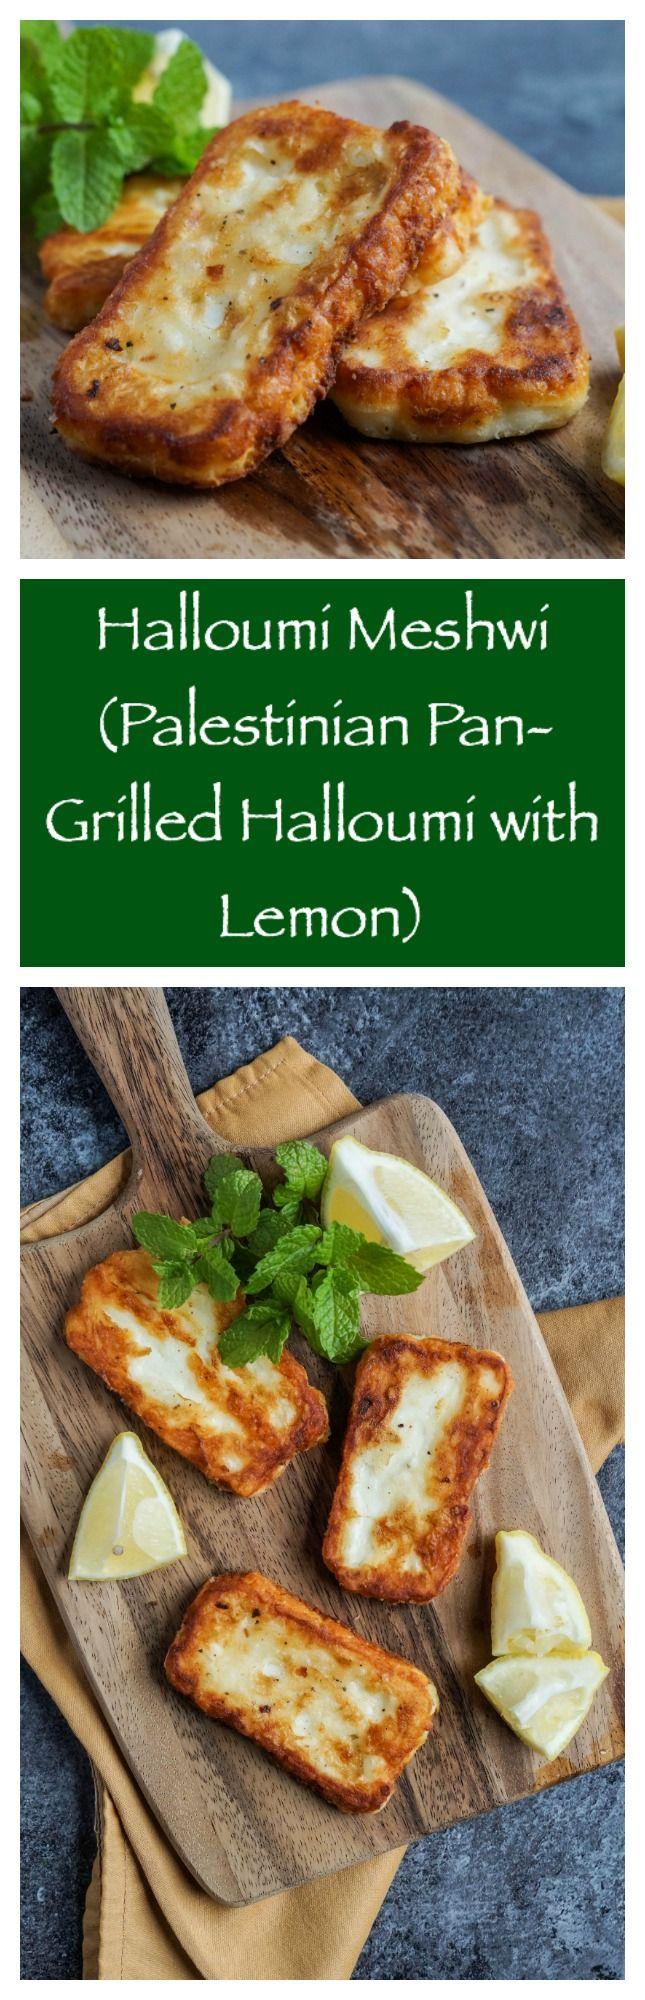 Halloumi Meshwi (Palestinian Pan-Grilled Halloumi with Lemon)  #halloumi #meshwi #palestine #palestinian #cheese #lemon #appetizer #snack